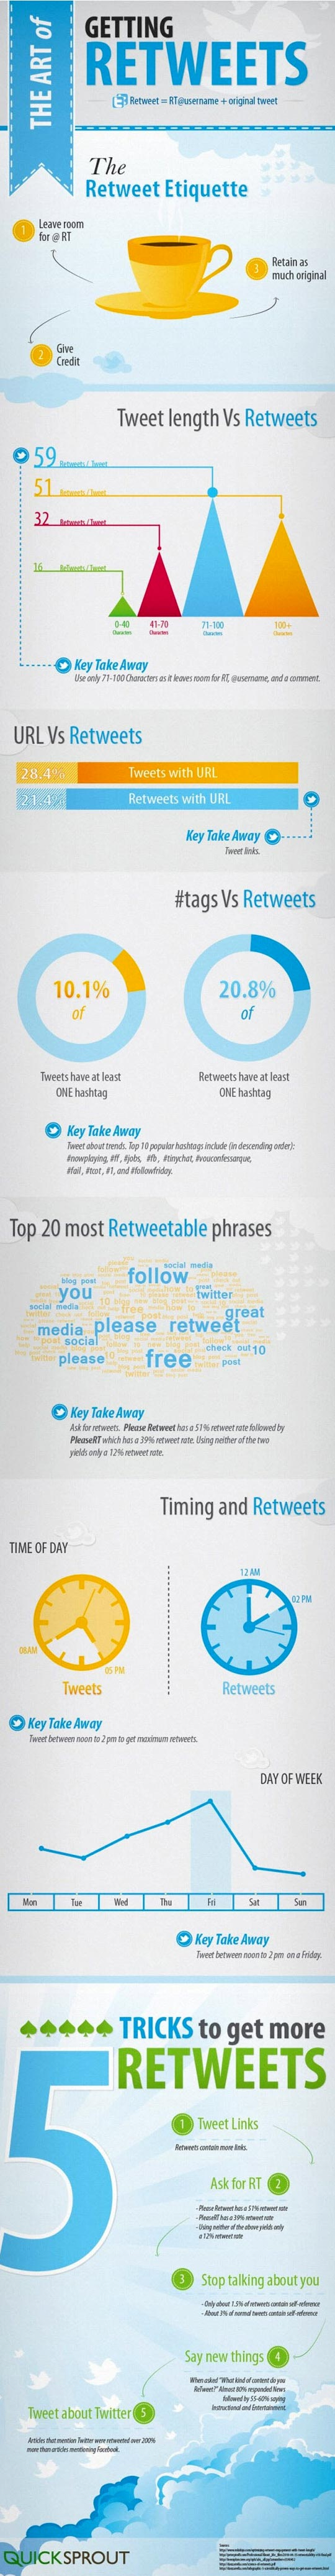 Retweet Etiquette Infographic